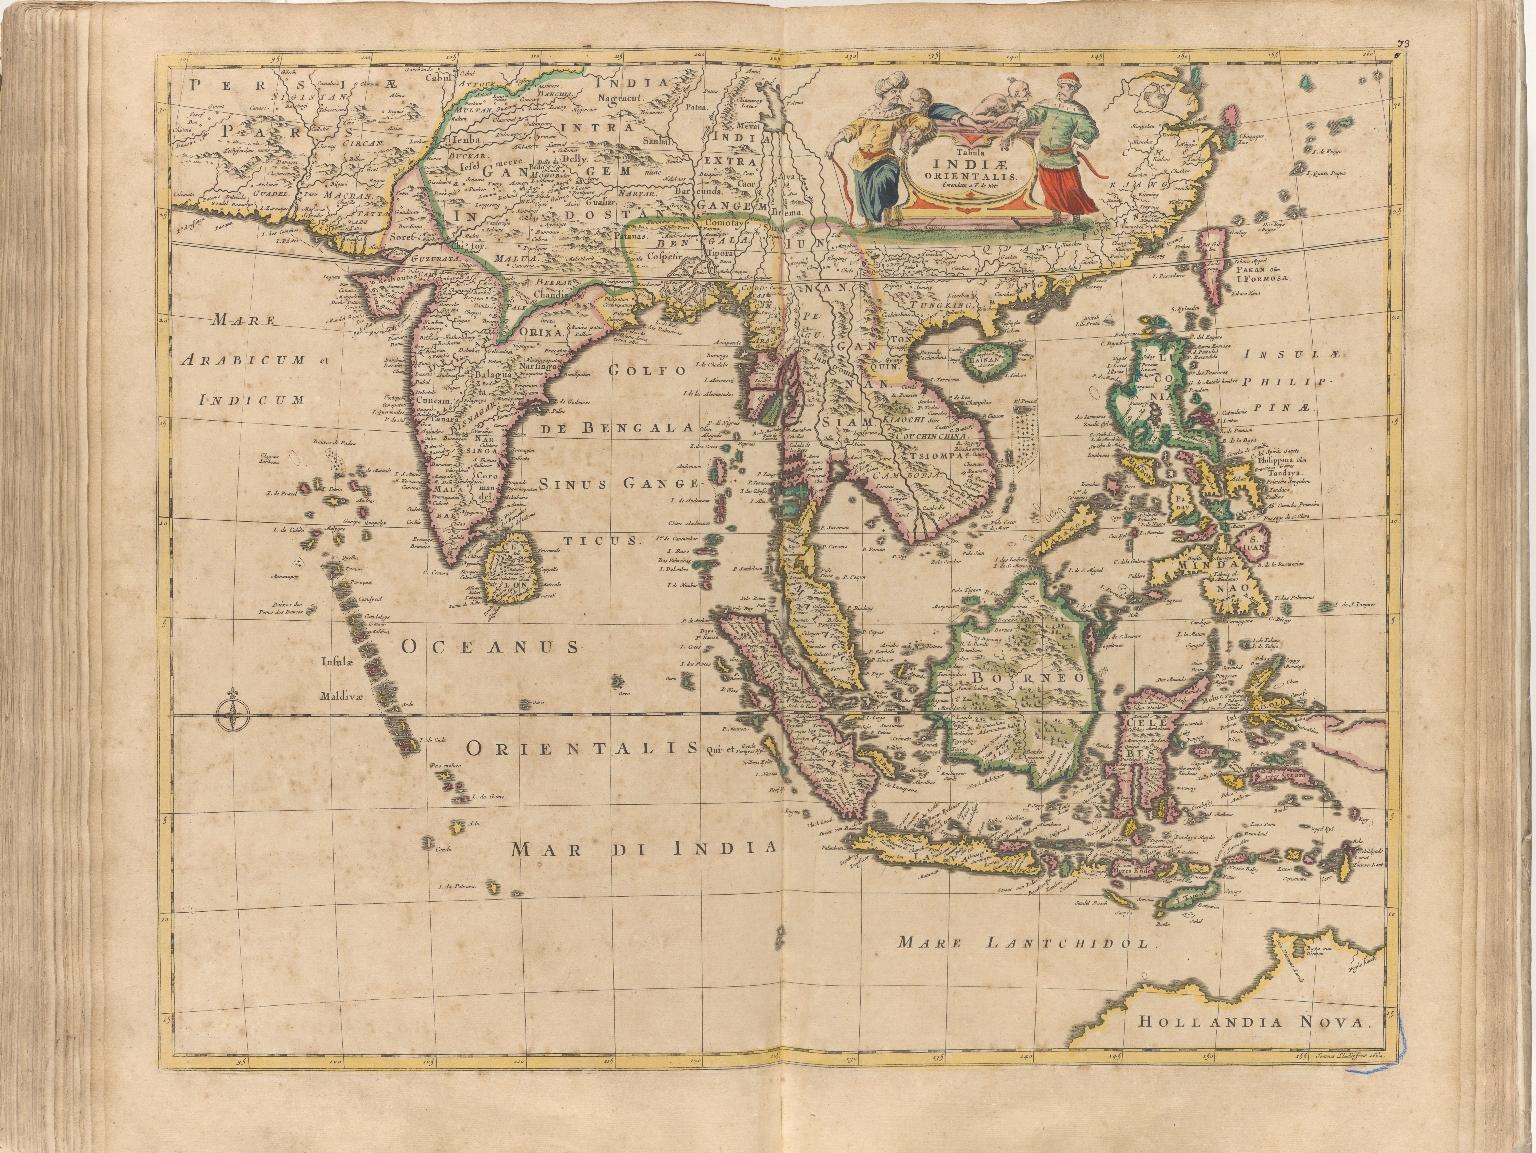 Tabula Indiae orientalis